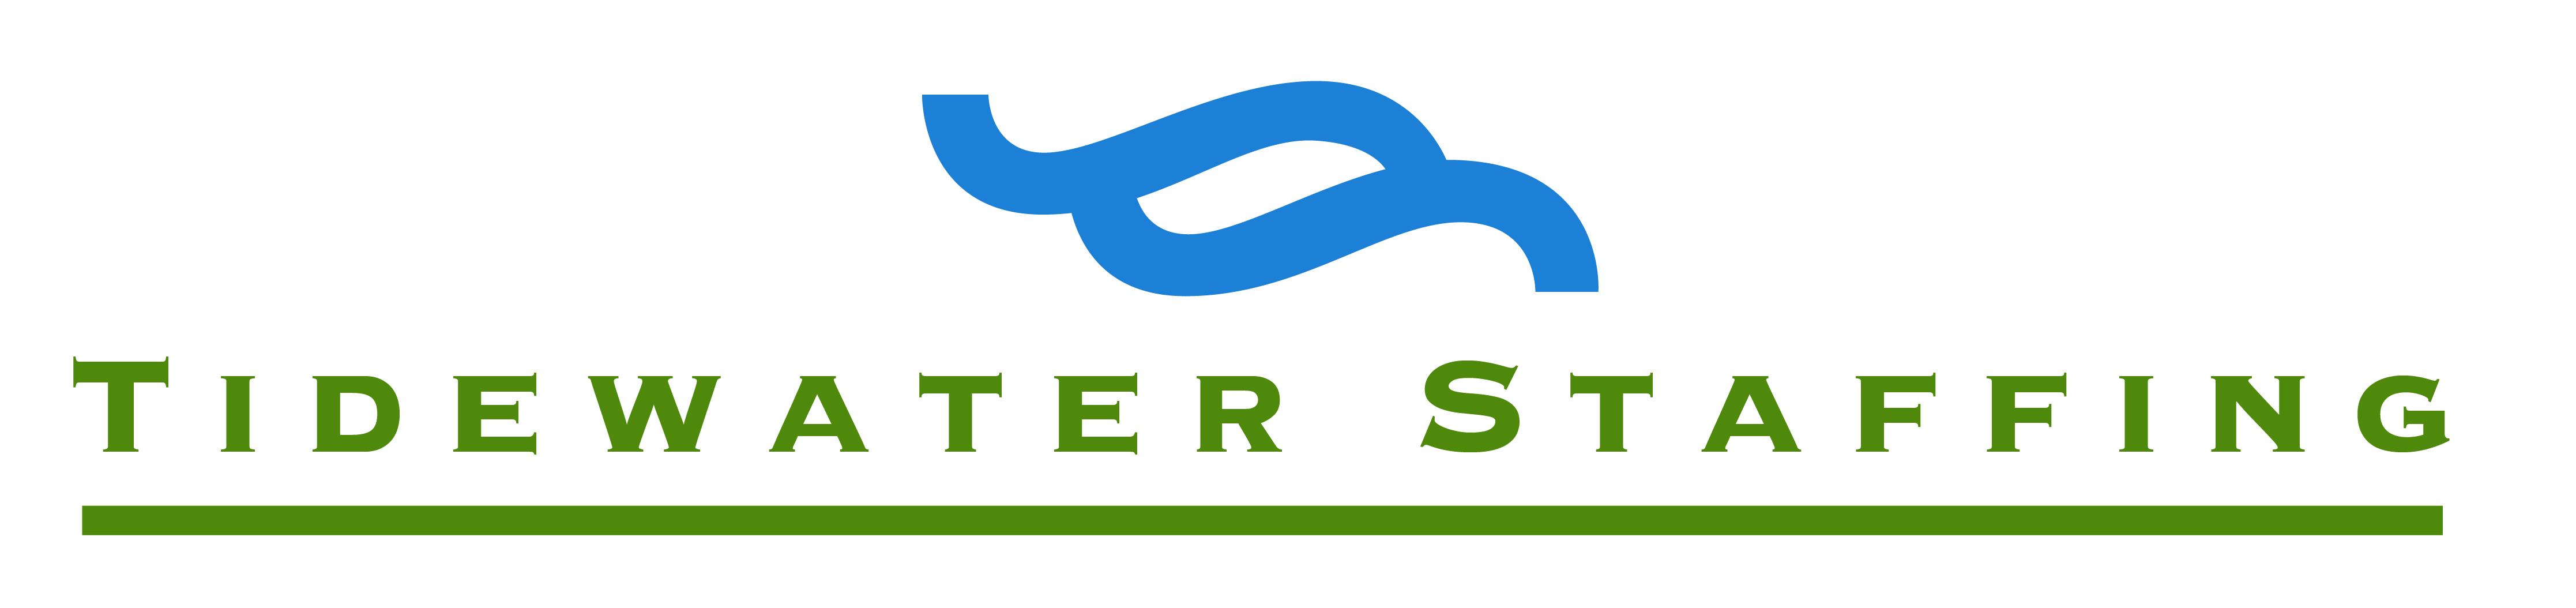 Tidewater Staffing Inc